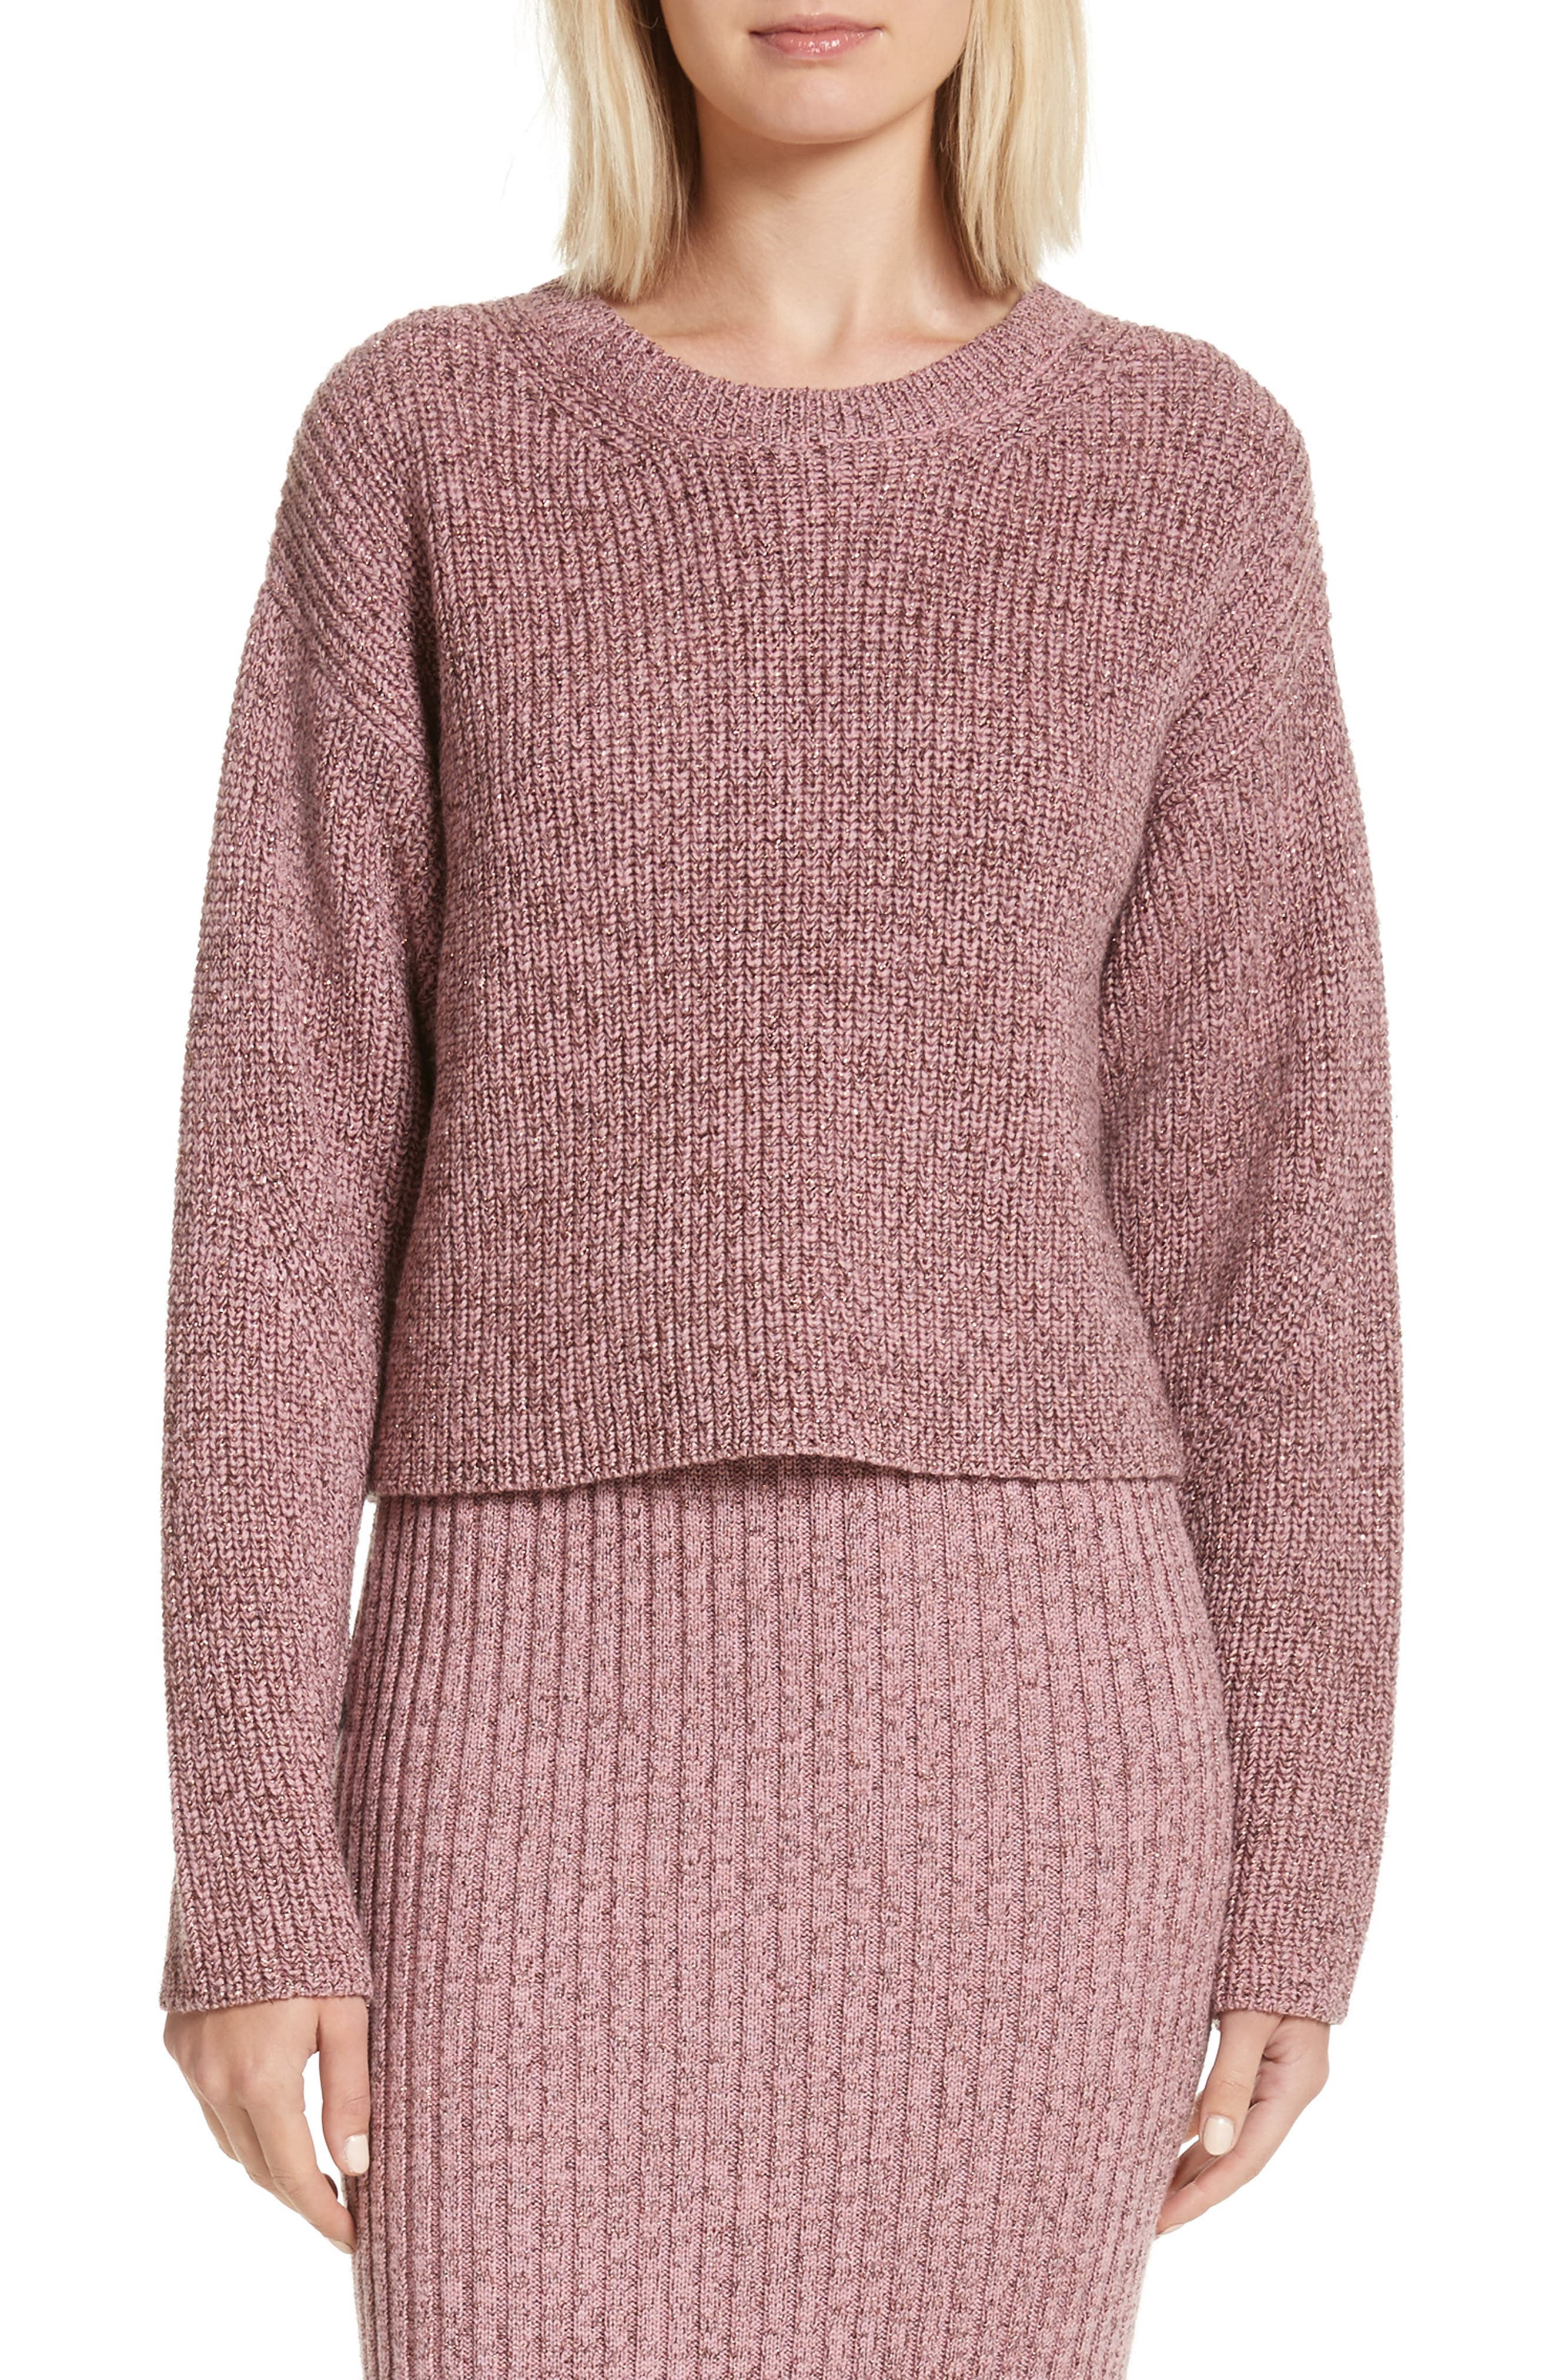 Leyton Metallic Knit Merino Wool Blend Sweater,                         Main,                         color, Dusty Rose